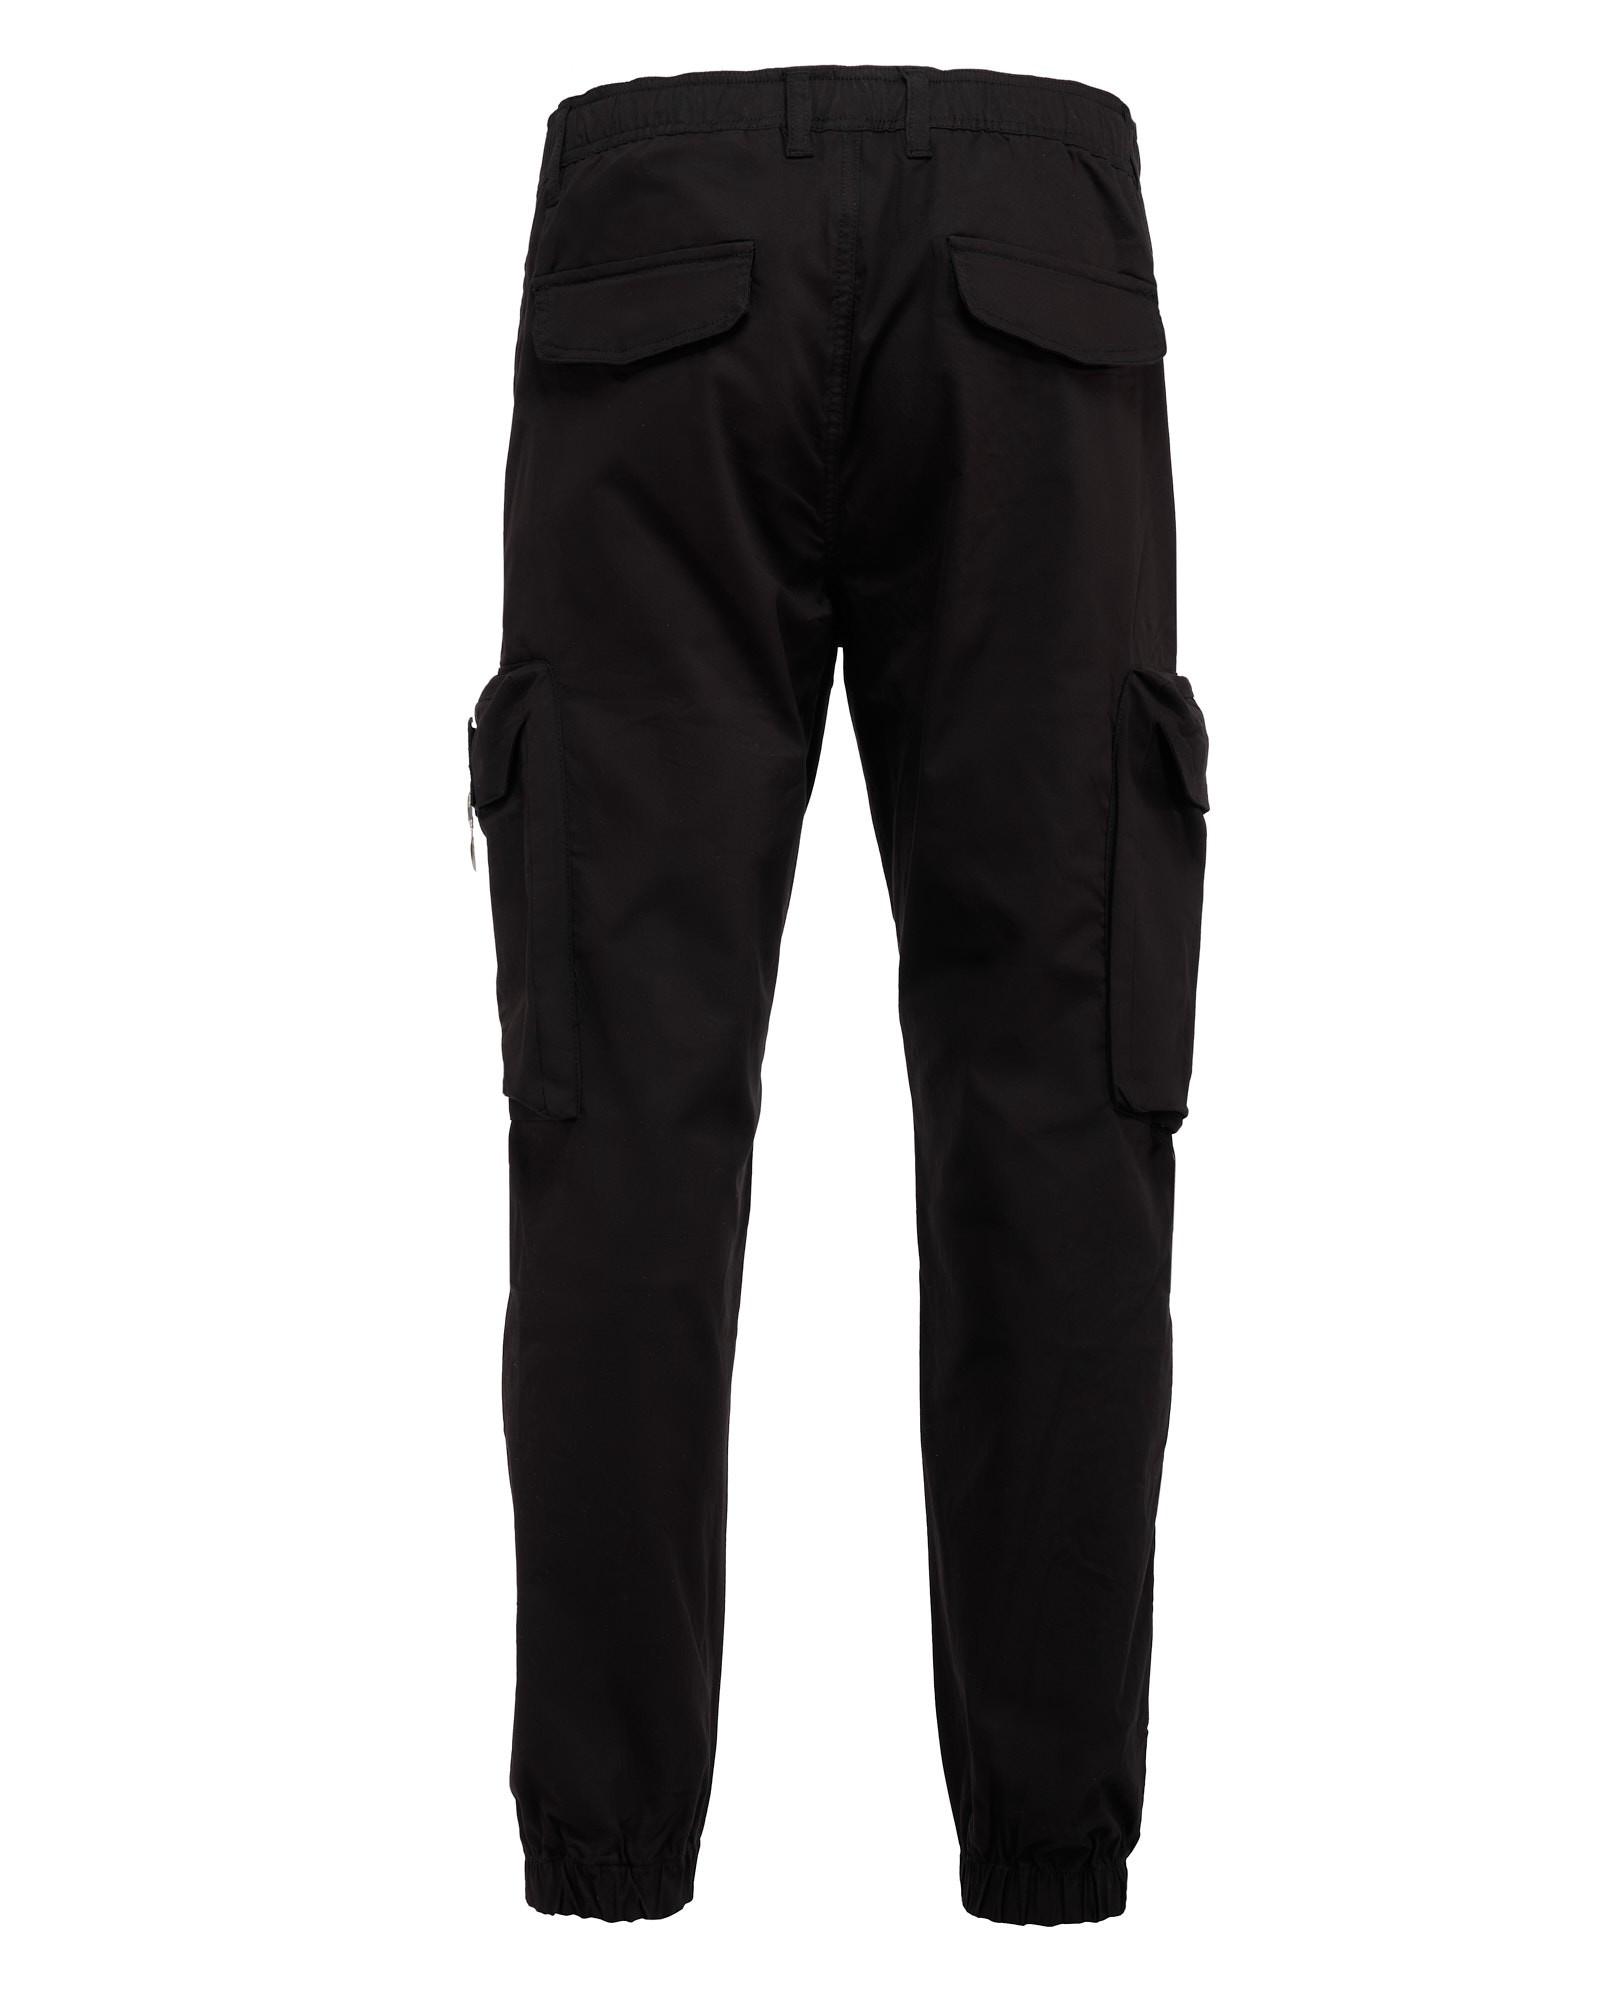 AVIATOR Kung-Fu Master Pants